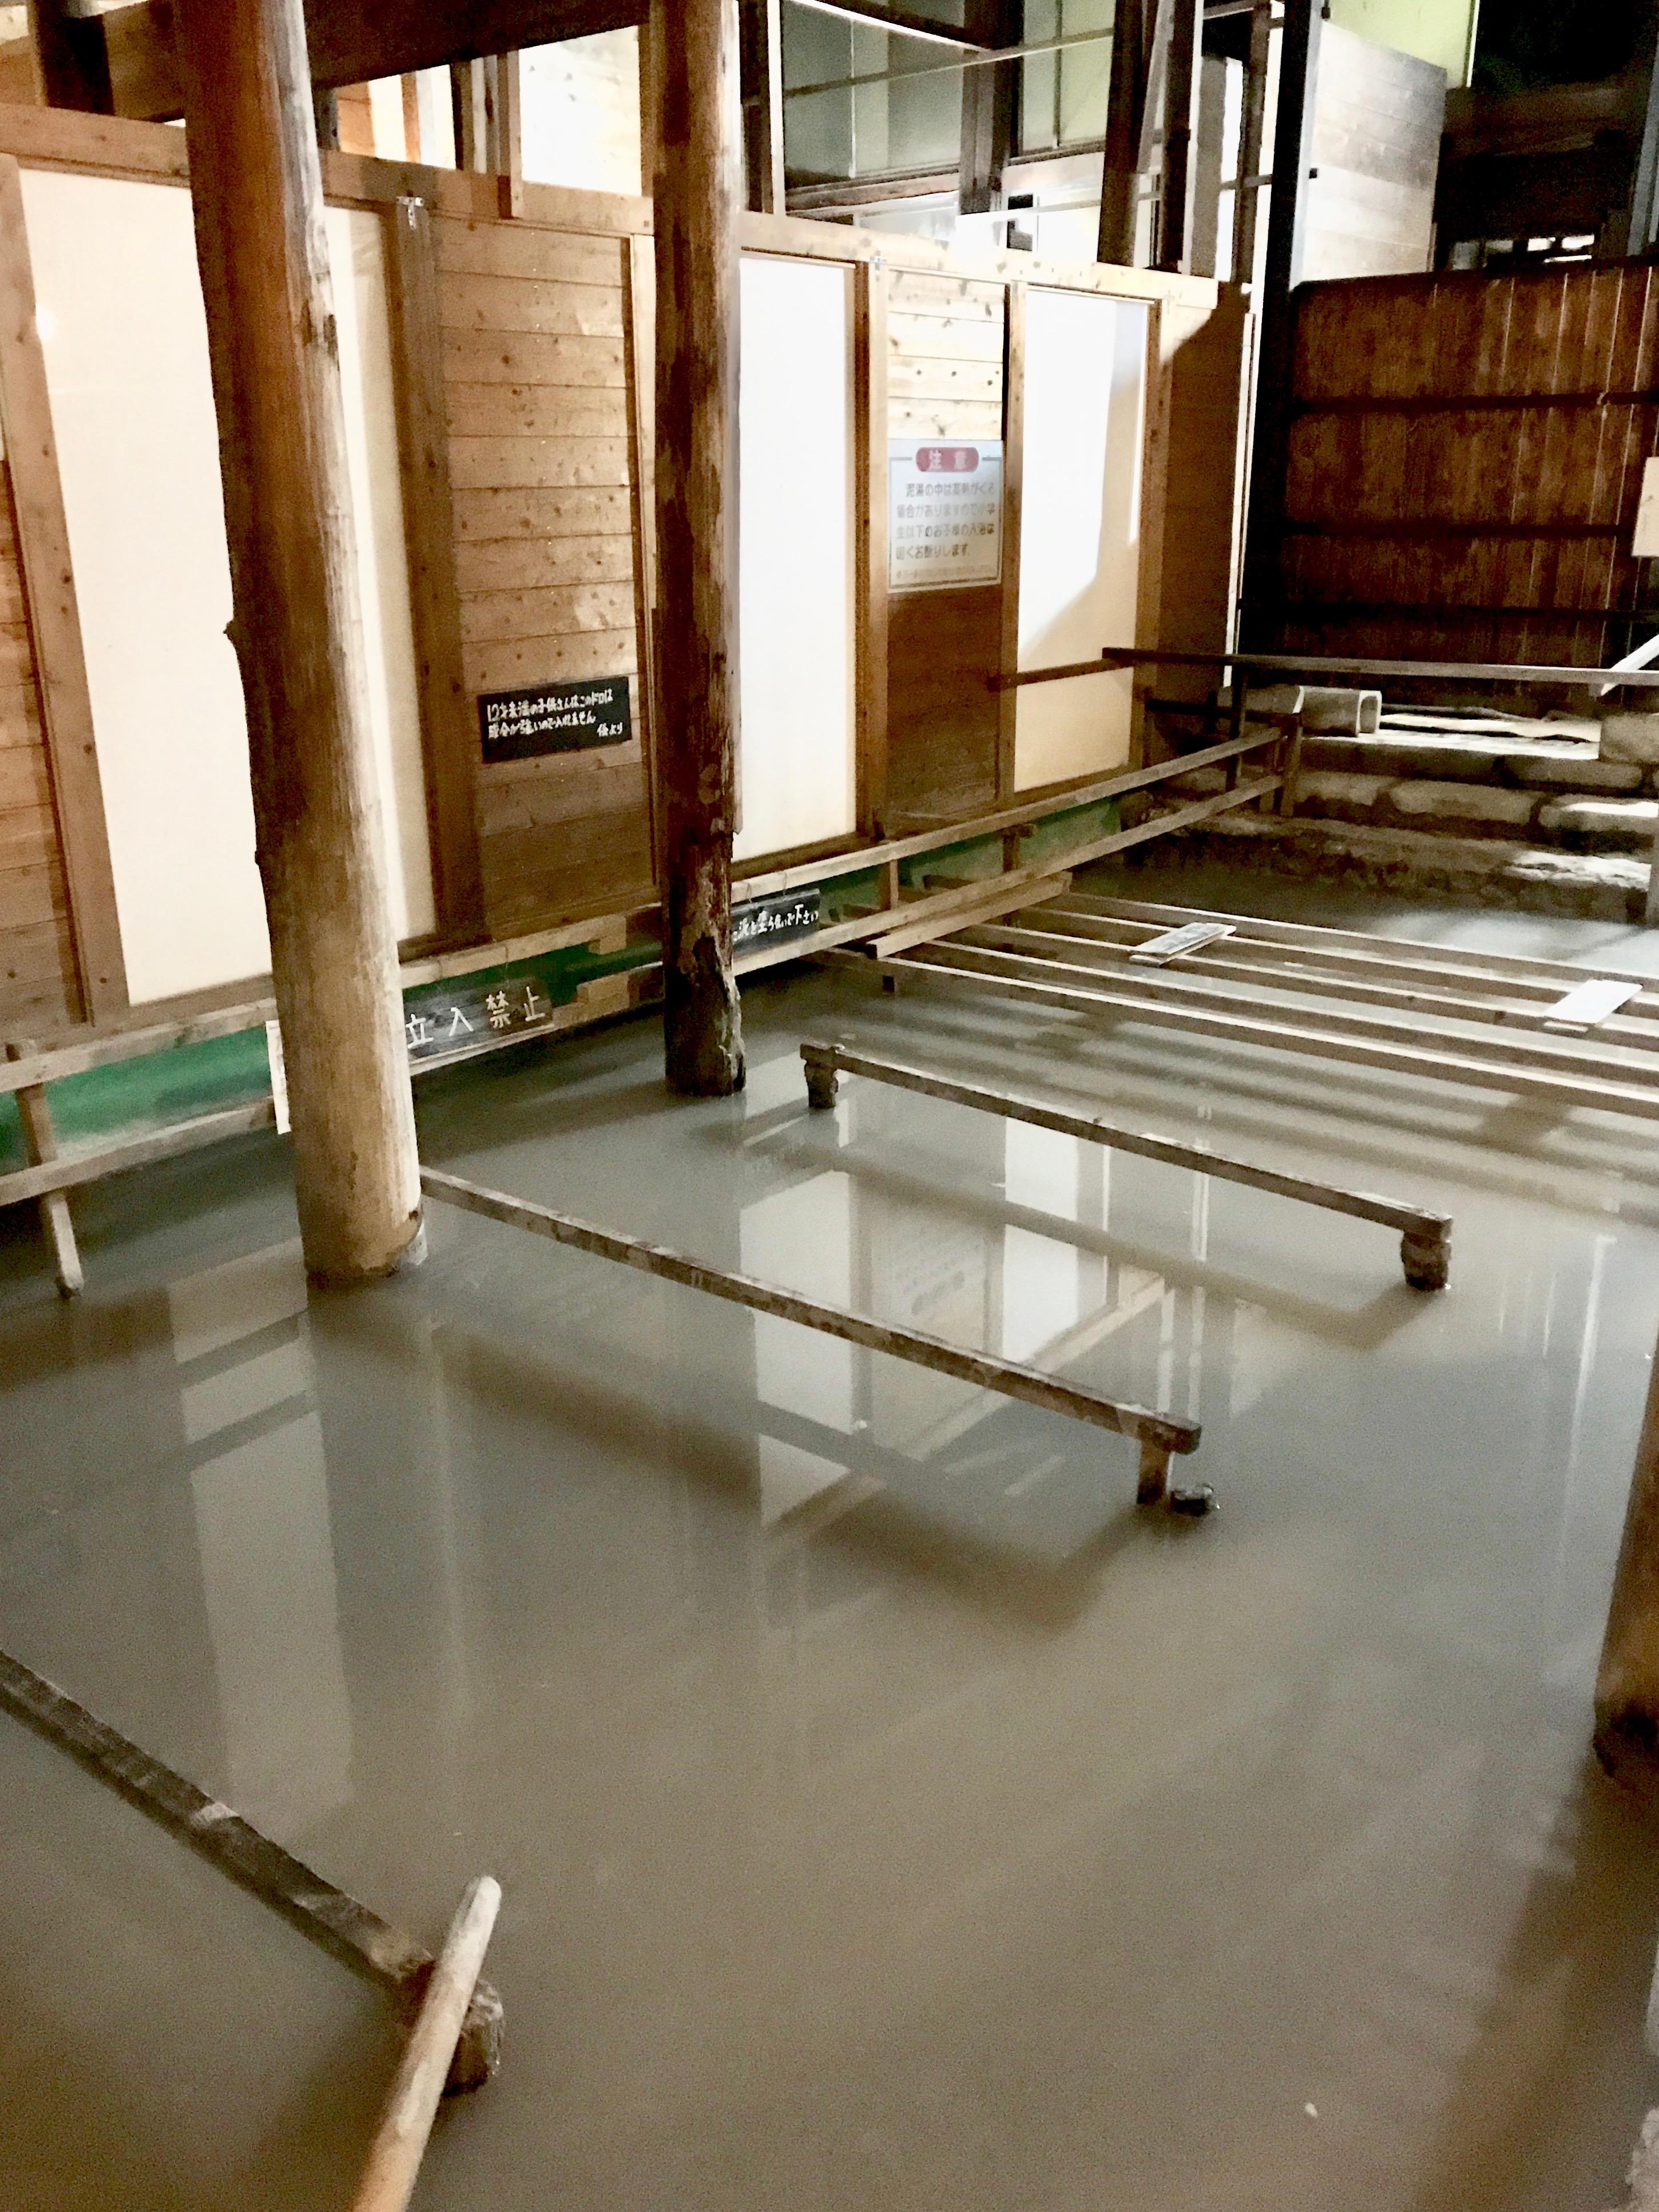 The indoor mud bath